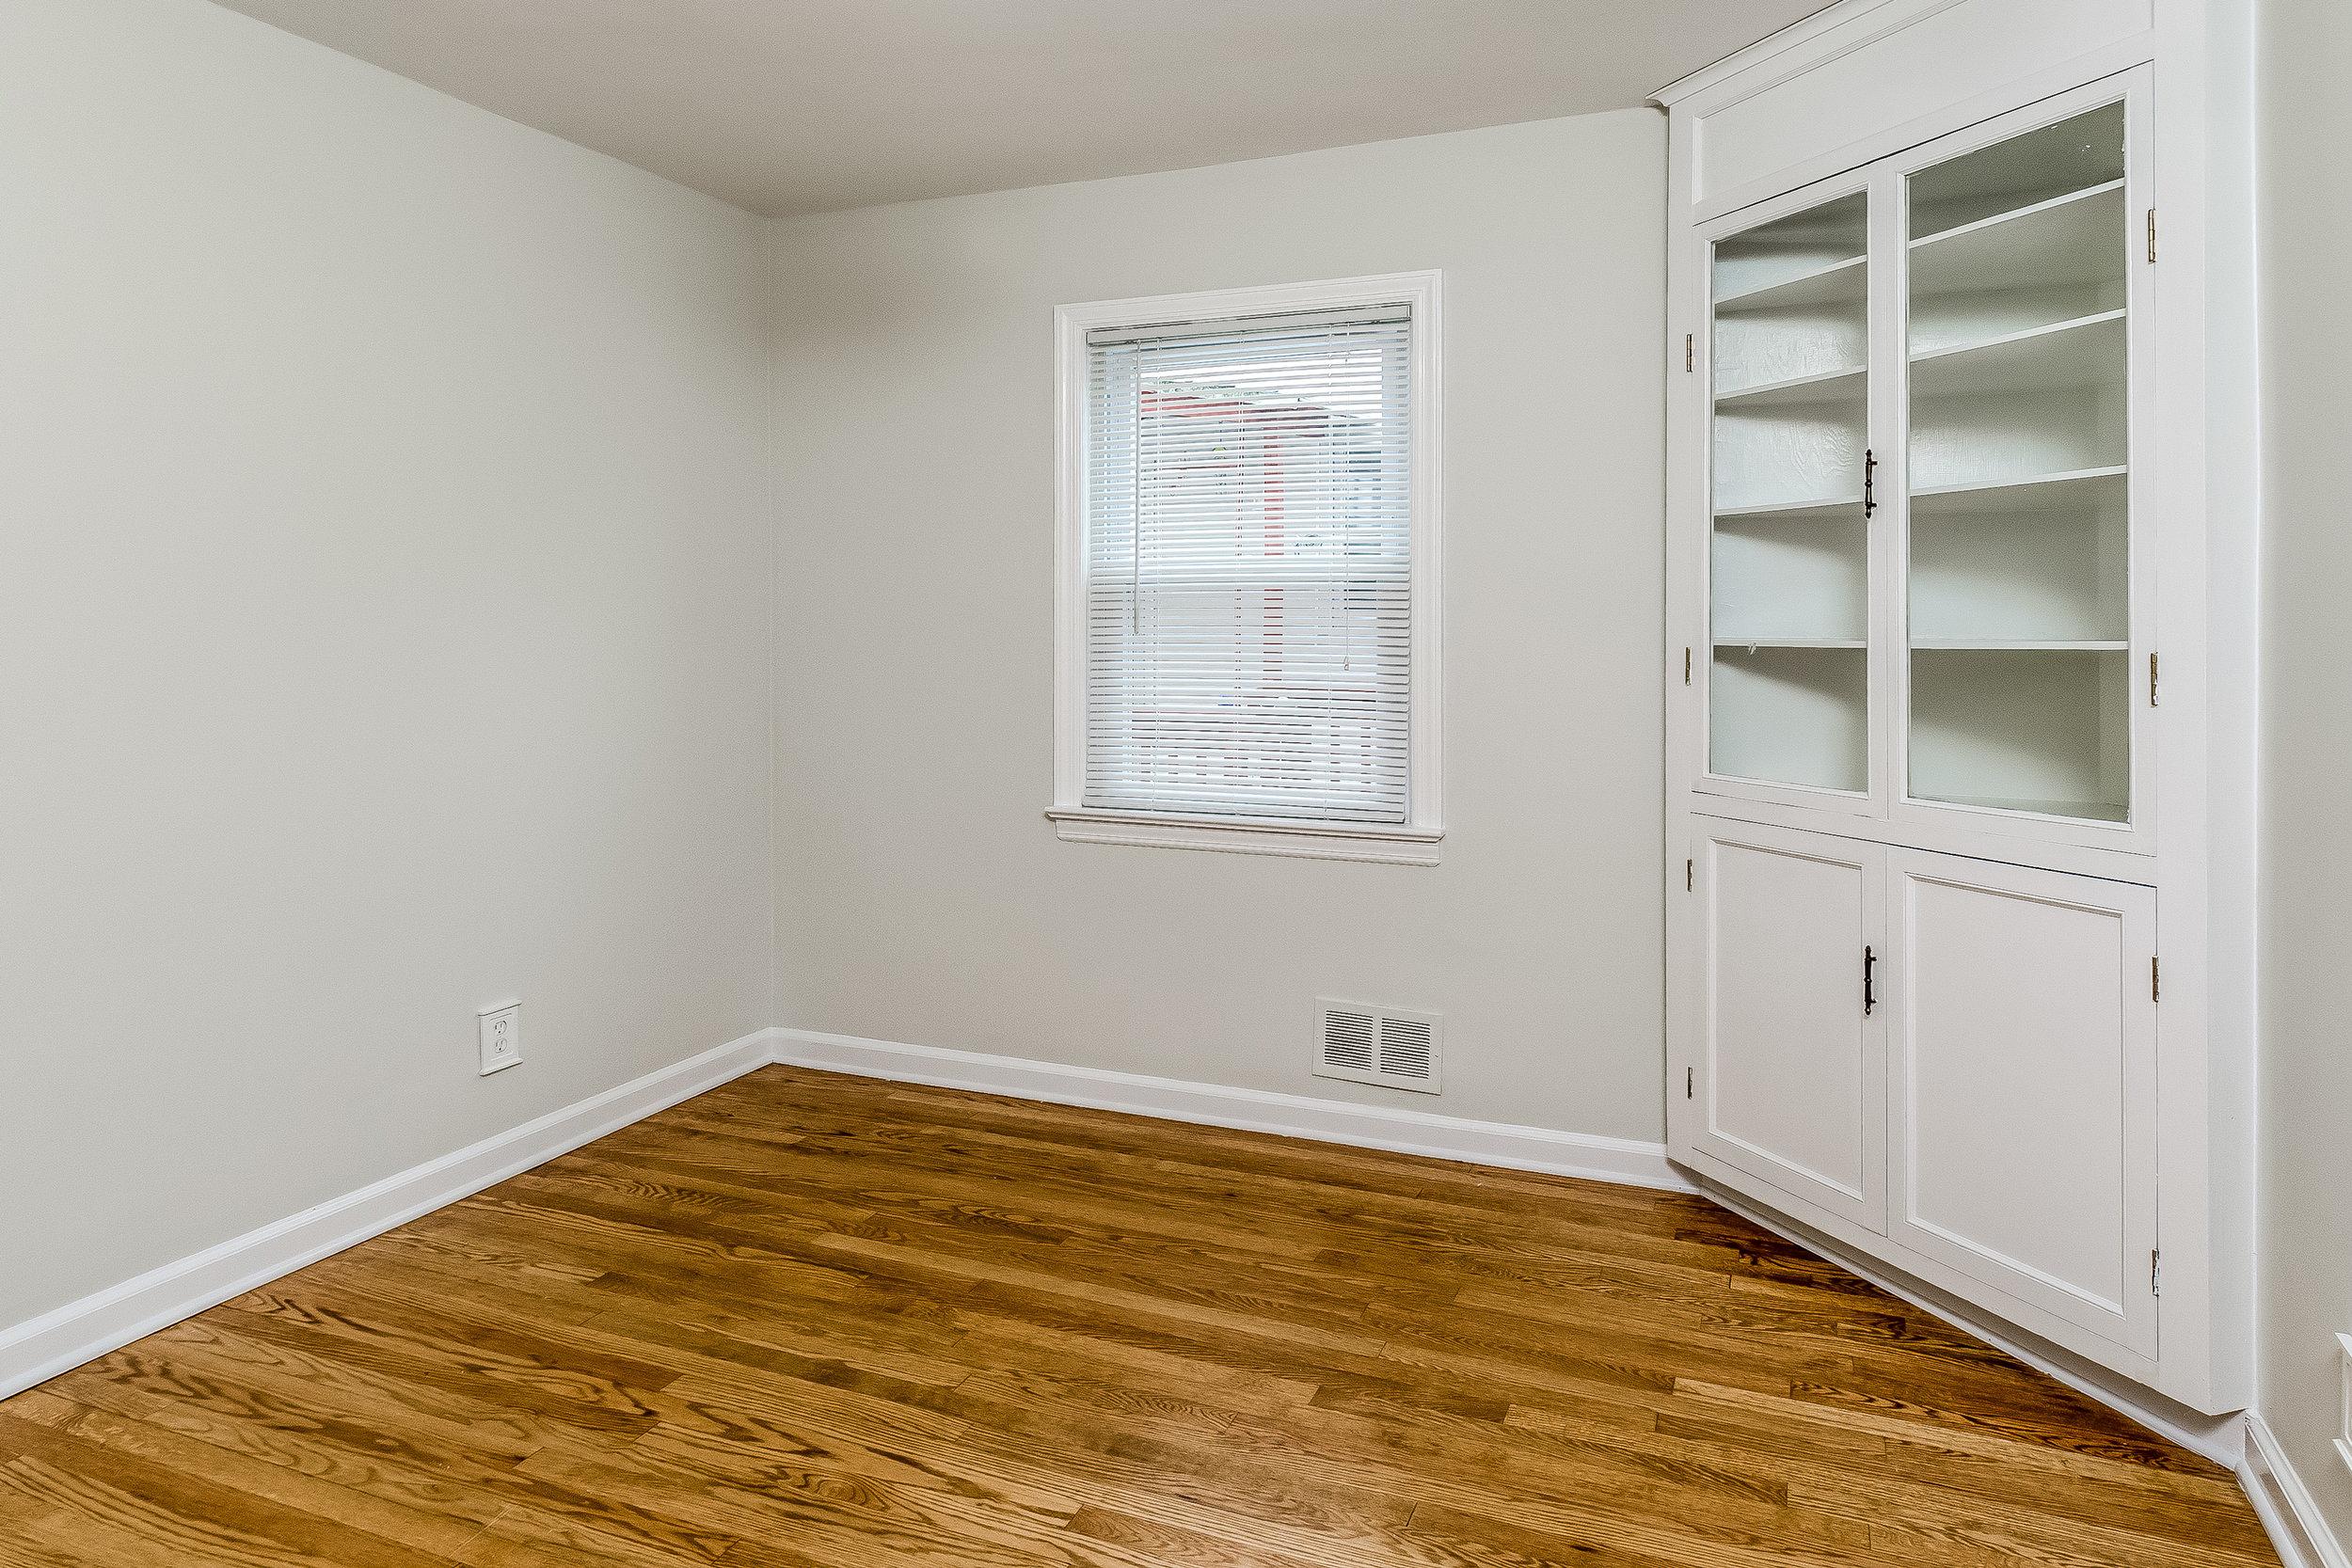 017-photo-bedroom-5786537.jpg